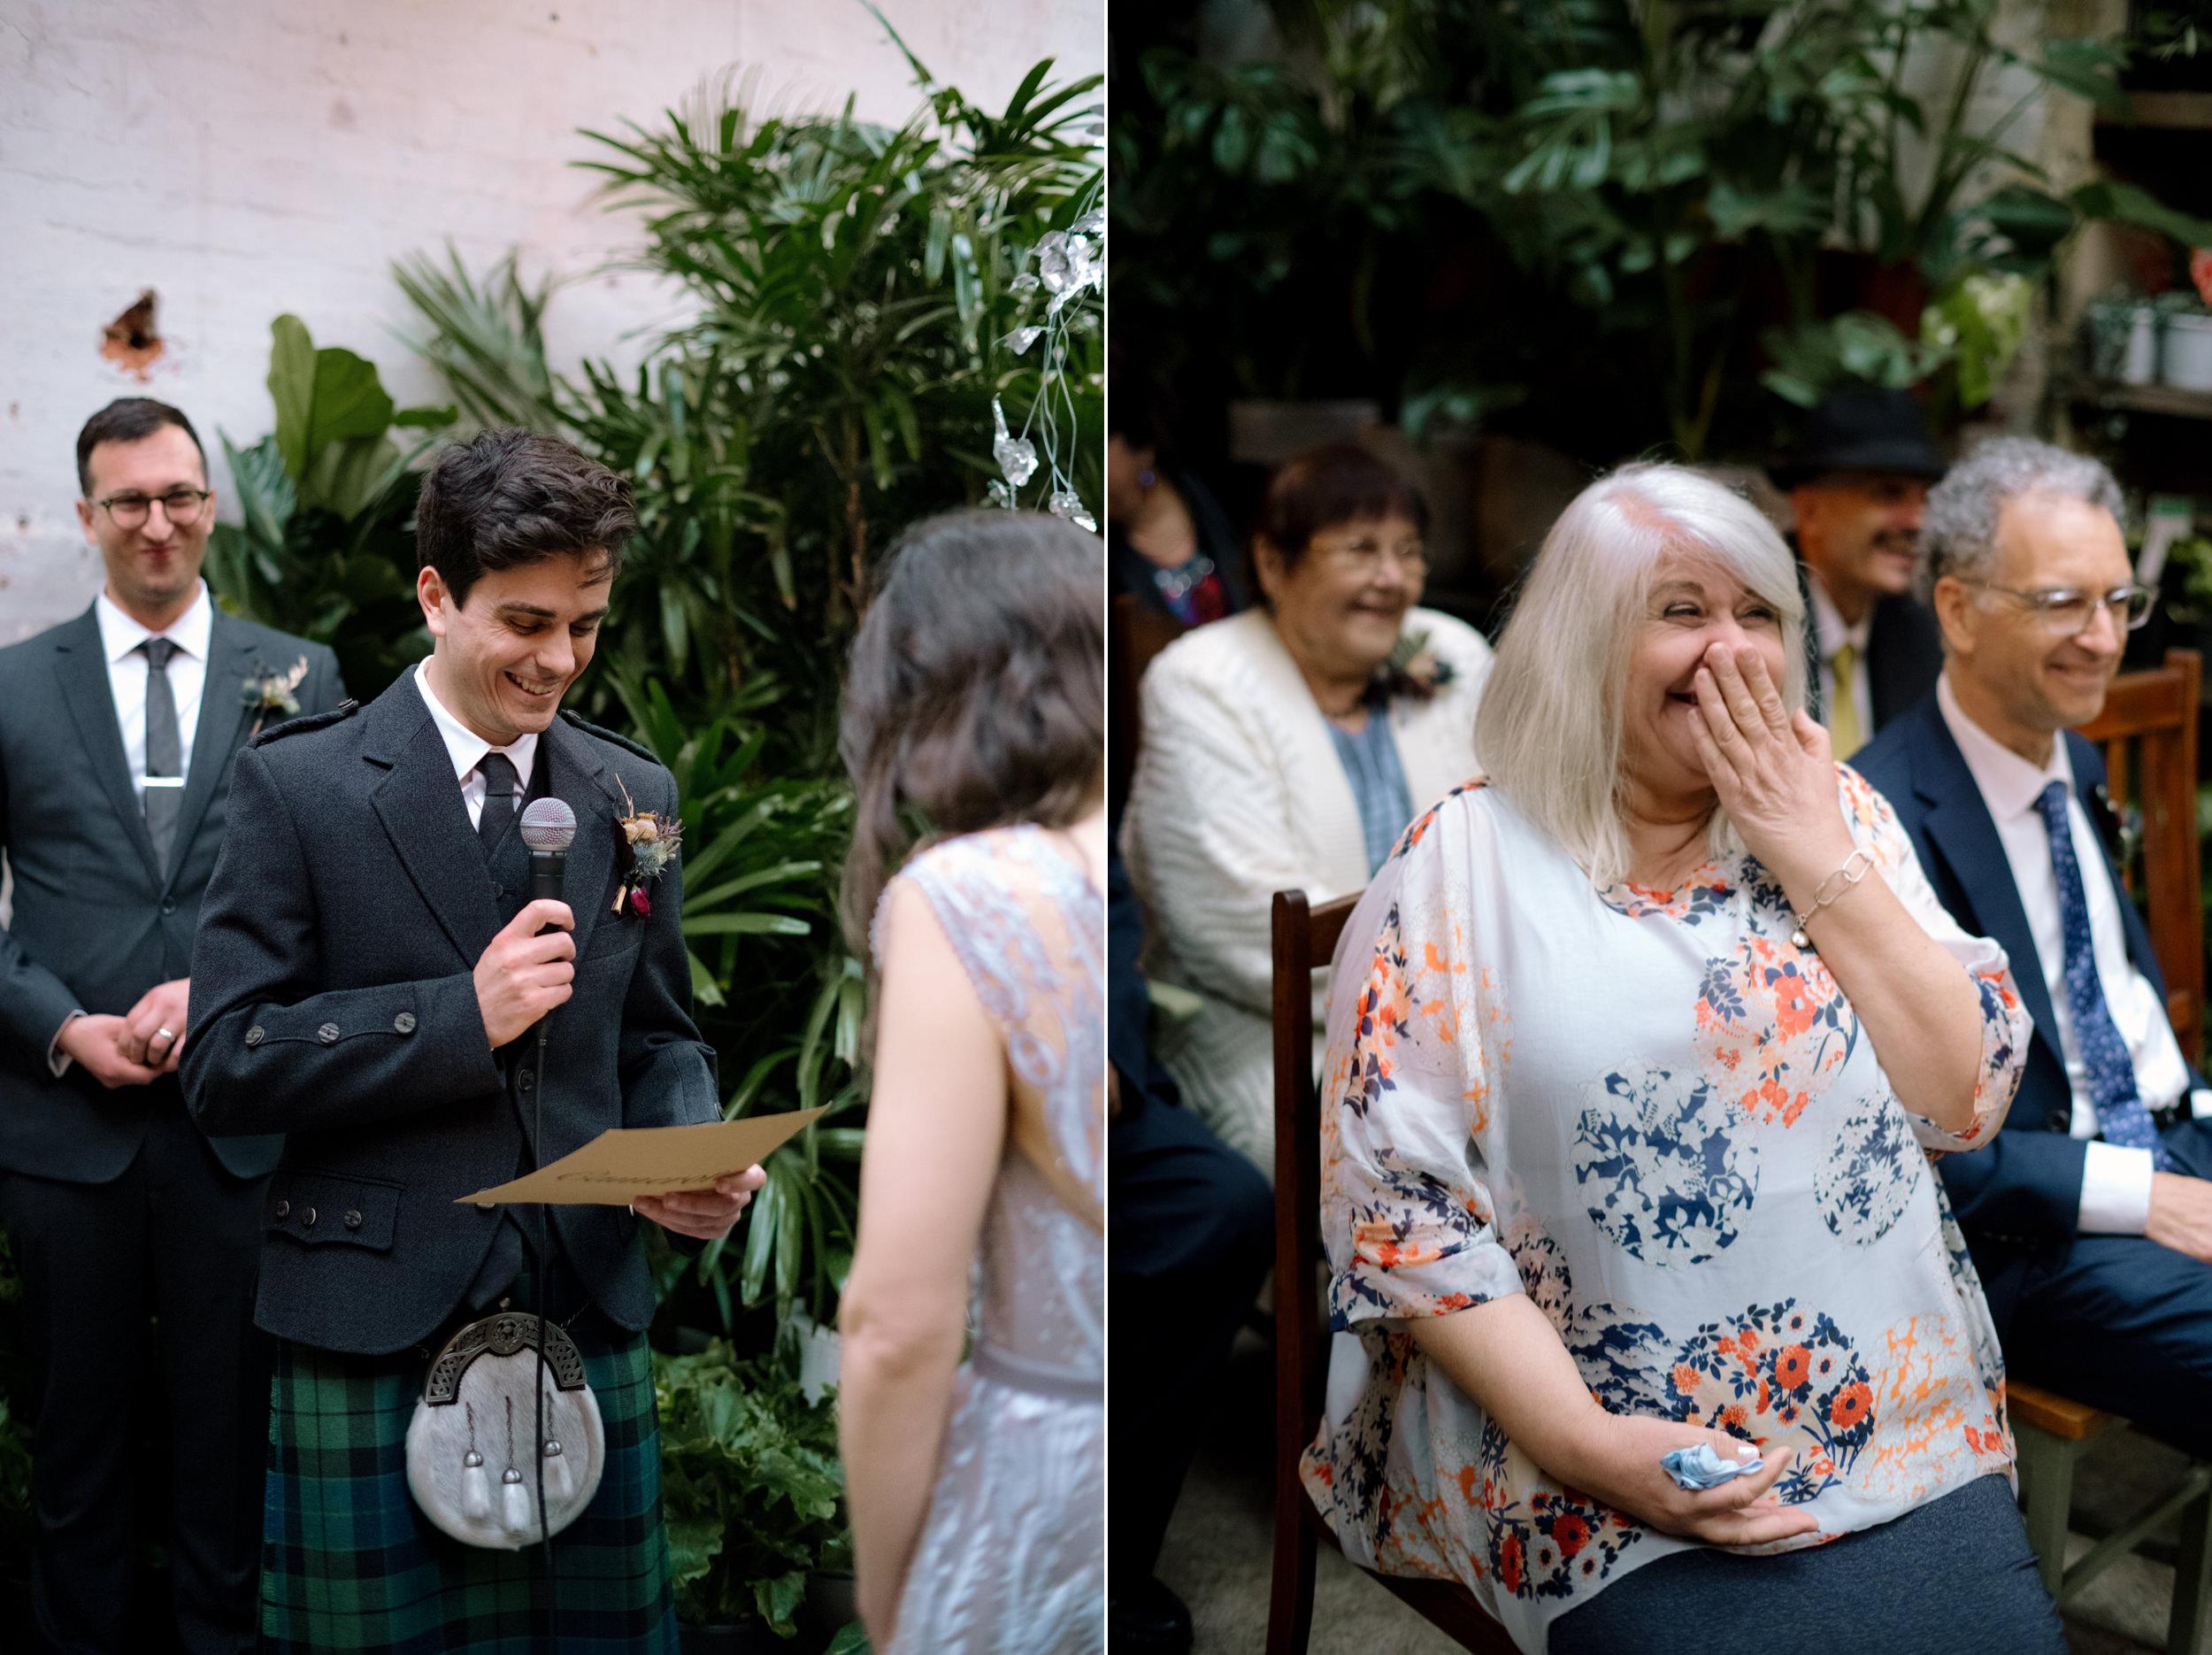 I-Got-You-Babe-&.Co.-Glasshaus-Wedding-Charlotte-Cameron0074.JPG